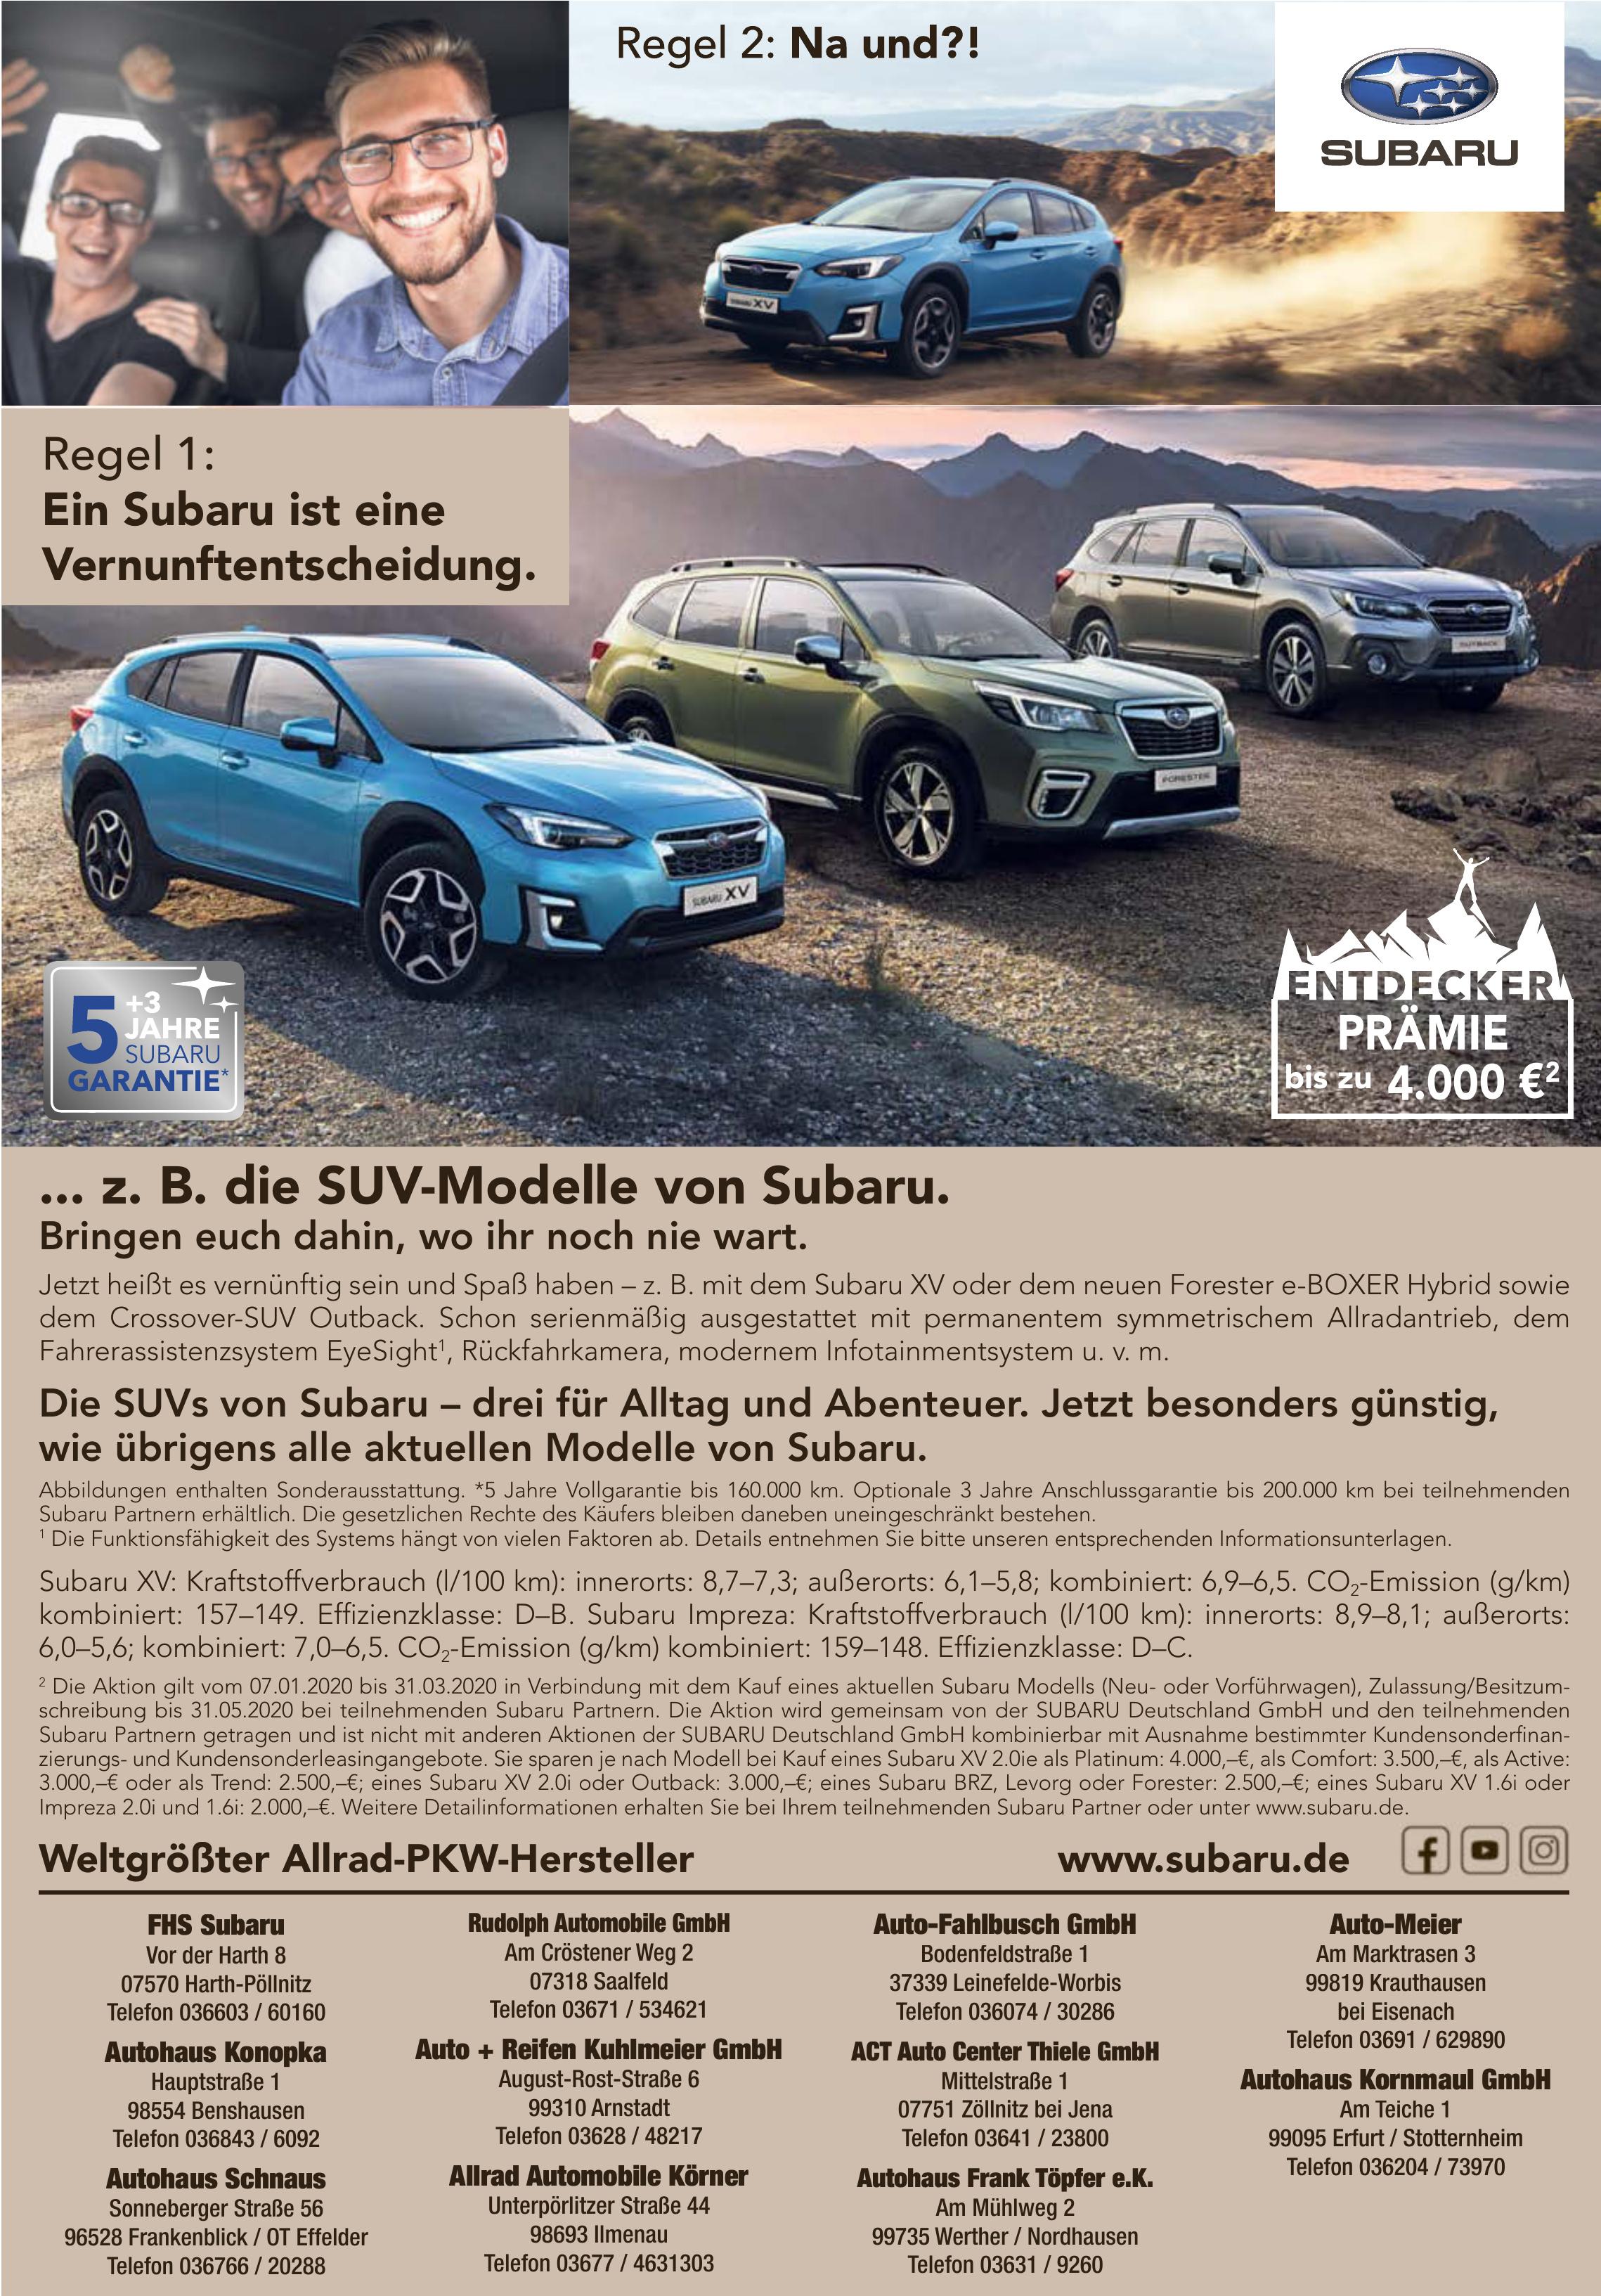 <br><b> FHS Subaru</b> <p></p> Vor der Harth 8  <p></p> 07570 Harth-Pöllnitz <p></p> Telefon 036603 / 60160 <p></p><a href='https://www.subaru.de'> www.subaru.de</a> </p> <hr> <br><b> Autohaus Konopka</b> <p></p> Hauptstraße 1 <p></p> 98554 Benshausen <p></p> Telefon 036843 / 6092 </p>  <hr> <br><b> Autohaus Schnaus</b> <p></p> Sonneberger Straße 56  <p></p> 96528 Frankenblick / OT Effelder  <p></p> Telefon 036766 / 20288 </p> <hr> <br><b> Rudolph Automobile GmbH</b> <p></p> Am Cröstener Weg 2 <p></p> 07318 Saalfeld <p></p> Telefon 03671 / 534621 </p> <hr> <br><b> Auto + Reifen Kuhlmeier GmbH</b> <p></p> August-Rost-Straße 6 <p></p> 99310 Arnstadt <p></p> Telefon 03628 / 48217 </p> <hr> <br><b> Allrad Automobile Körner</b> <p></p> Unterpörlitzer Straße 44 <p></p> 98693 Ilmenau <p></p> Telefon 03677 / 4631303 </p> <hr> <br><b> Auto-Fahlbusch GmbH</b> <p></p> Bodenfeldstraße 1 <p></p> 37339 Leinefelde-Worbis <p></p> Telefon 036074 / 30286 </p>  <hr> <br><b> ACT Auto Center Thiele GmbH</b> <p></p> Mittelstraße 1 <p></p> 07751 Zöllnitz bei Jena <p></p> Telefon 03641 / 23800 </p> <hr> <br><b> Autohaus Frank Töpfer e.K.</b> <p></p> Am Mühlweg 2 <p></p> 99735 Werther / Nordhausen  <p></p> Telefon 03631 / 9260 </p> <hr> <br><b> Auto-Meier</b> <p></p> Am Marktrasen 3  <p></p> 99819 Krauthausen bei Eisenach <p></p> Telefon 03691 / 629890 </p> <hr> <br><b> Autohaus Kornmaul GmbH</b> <p></p> Am Teiche 1 <p></p> 99095 Erfurt / Stotternheim <p></p> Telefon 036204 / 73970 </p>